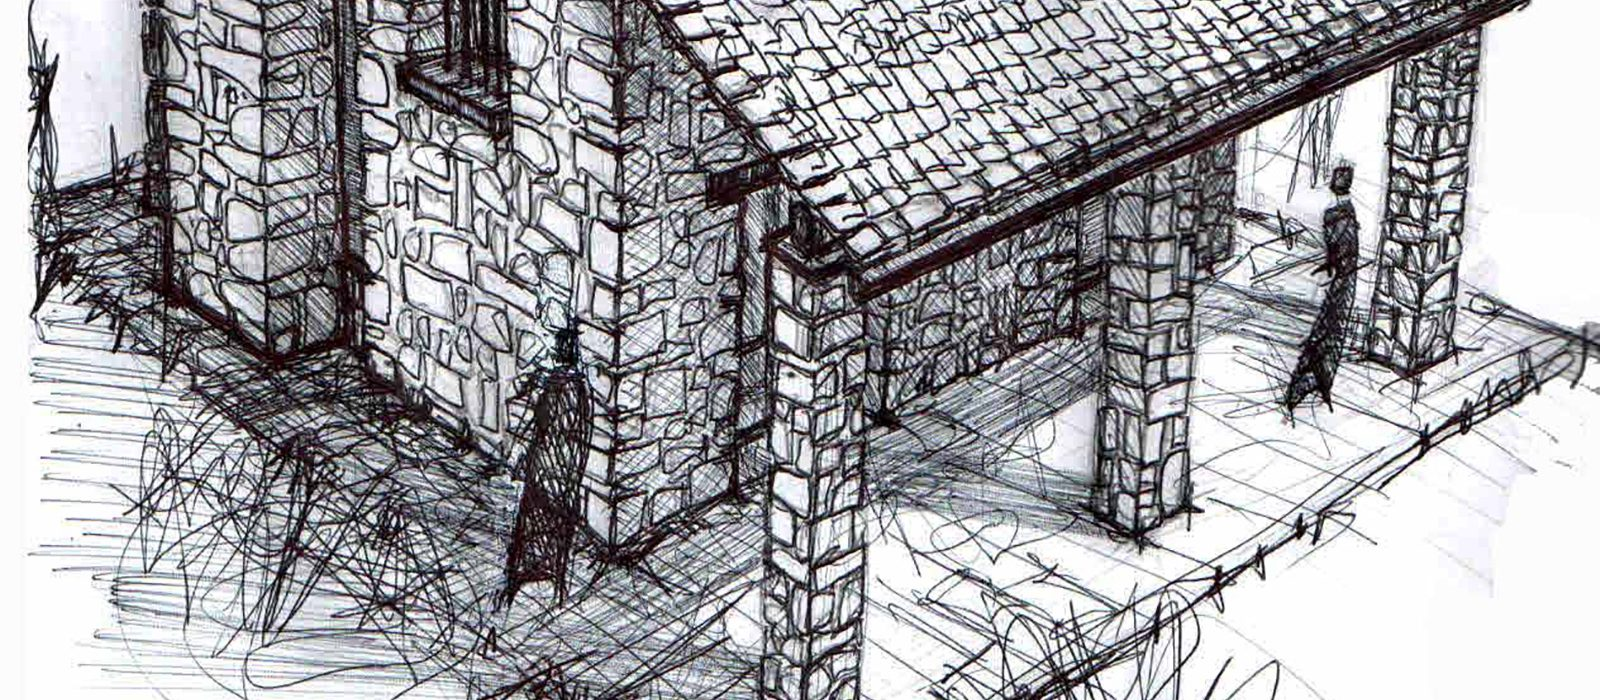 01_disegni_giuseppe_passaro_architetto_reggio_emilia_casa_montagna